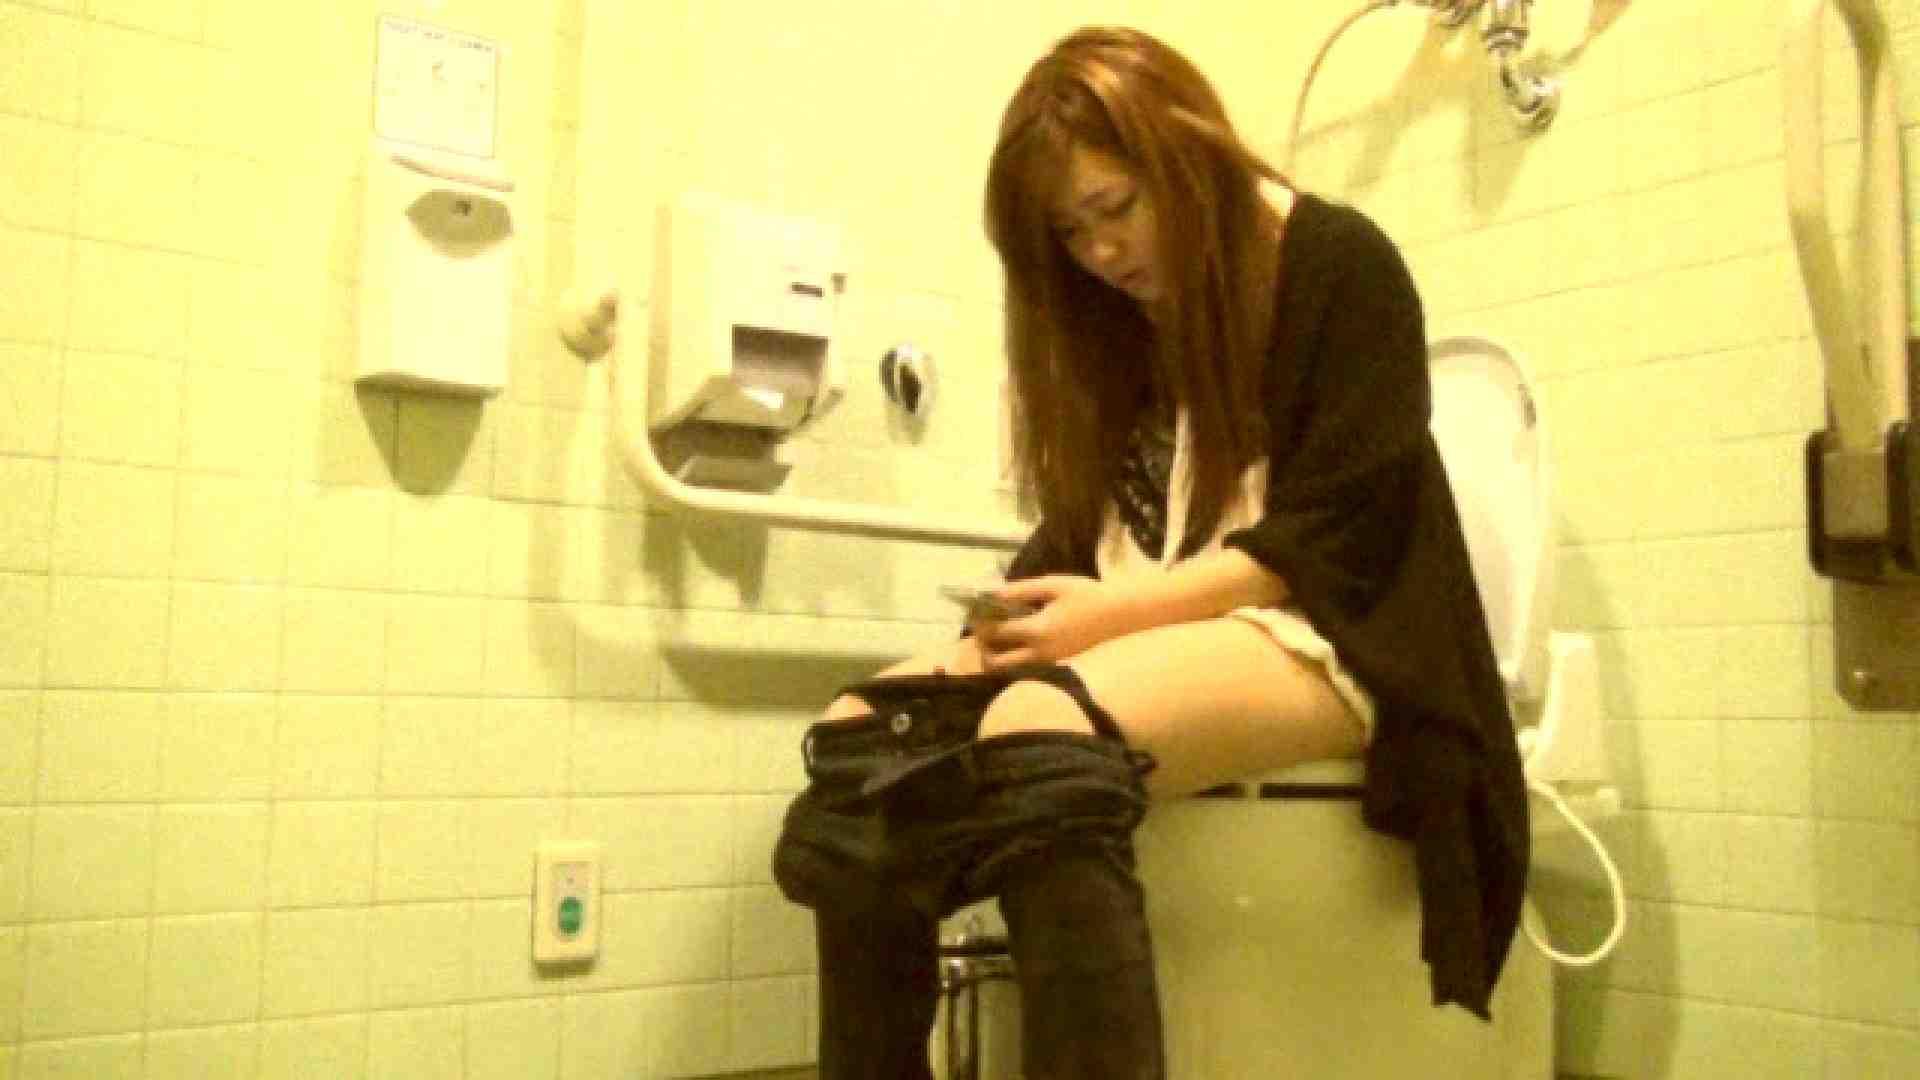 vol.26 【SKちゃん(洗面所)】ガールズバー店員 19歳 キャバ嬢  72PIX 22